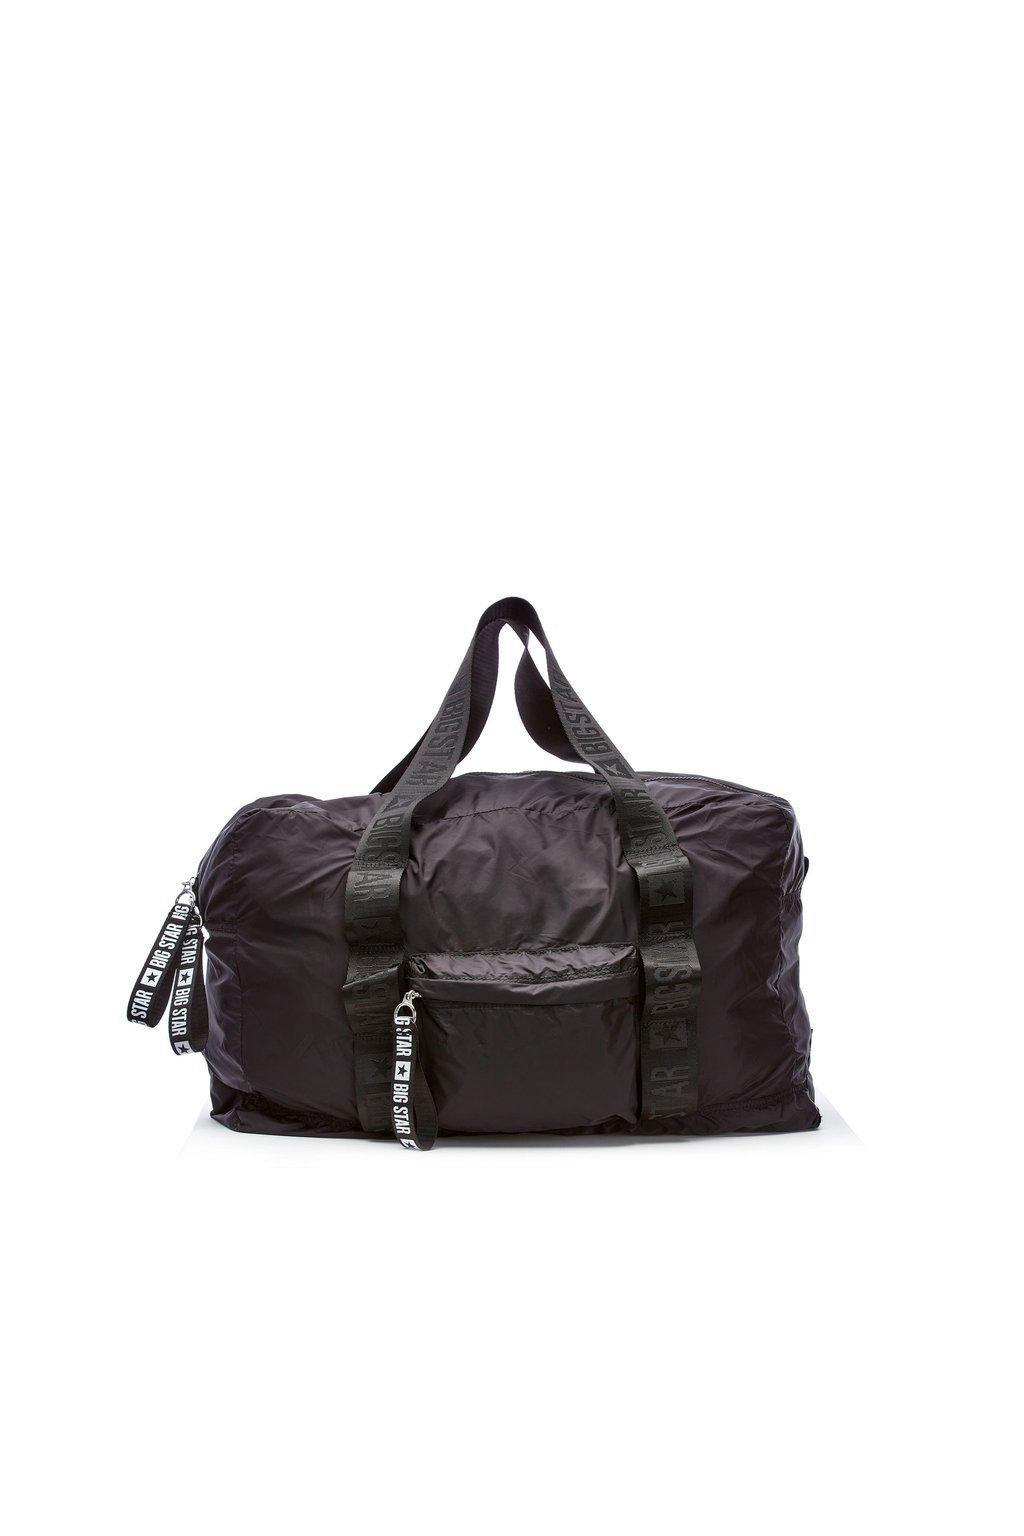 Dámska kabelka čierna kód kabelky GG574142 BLK